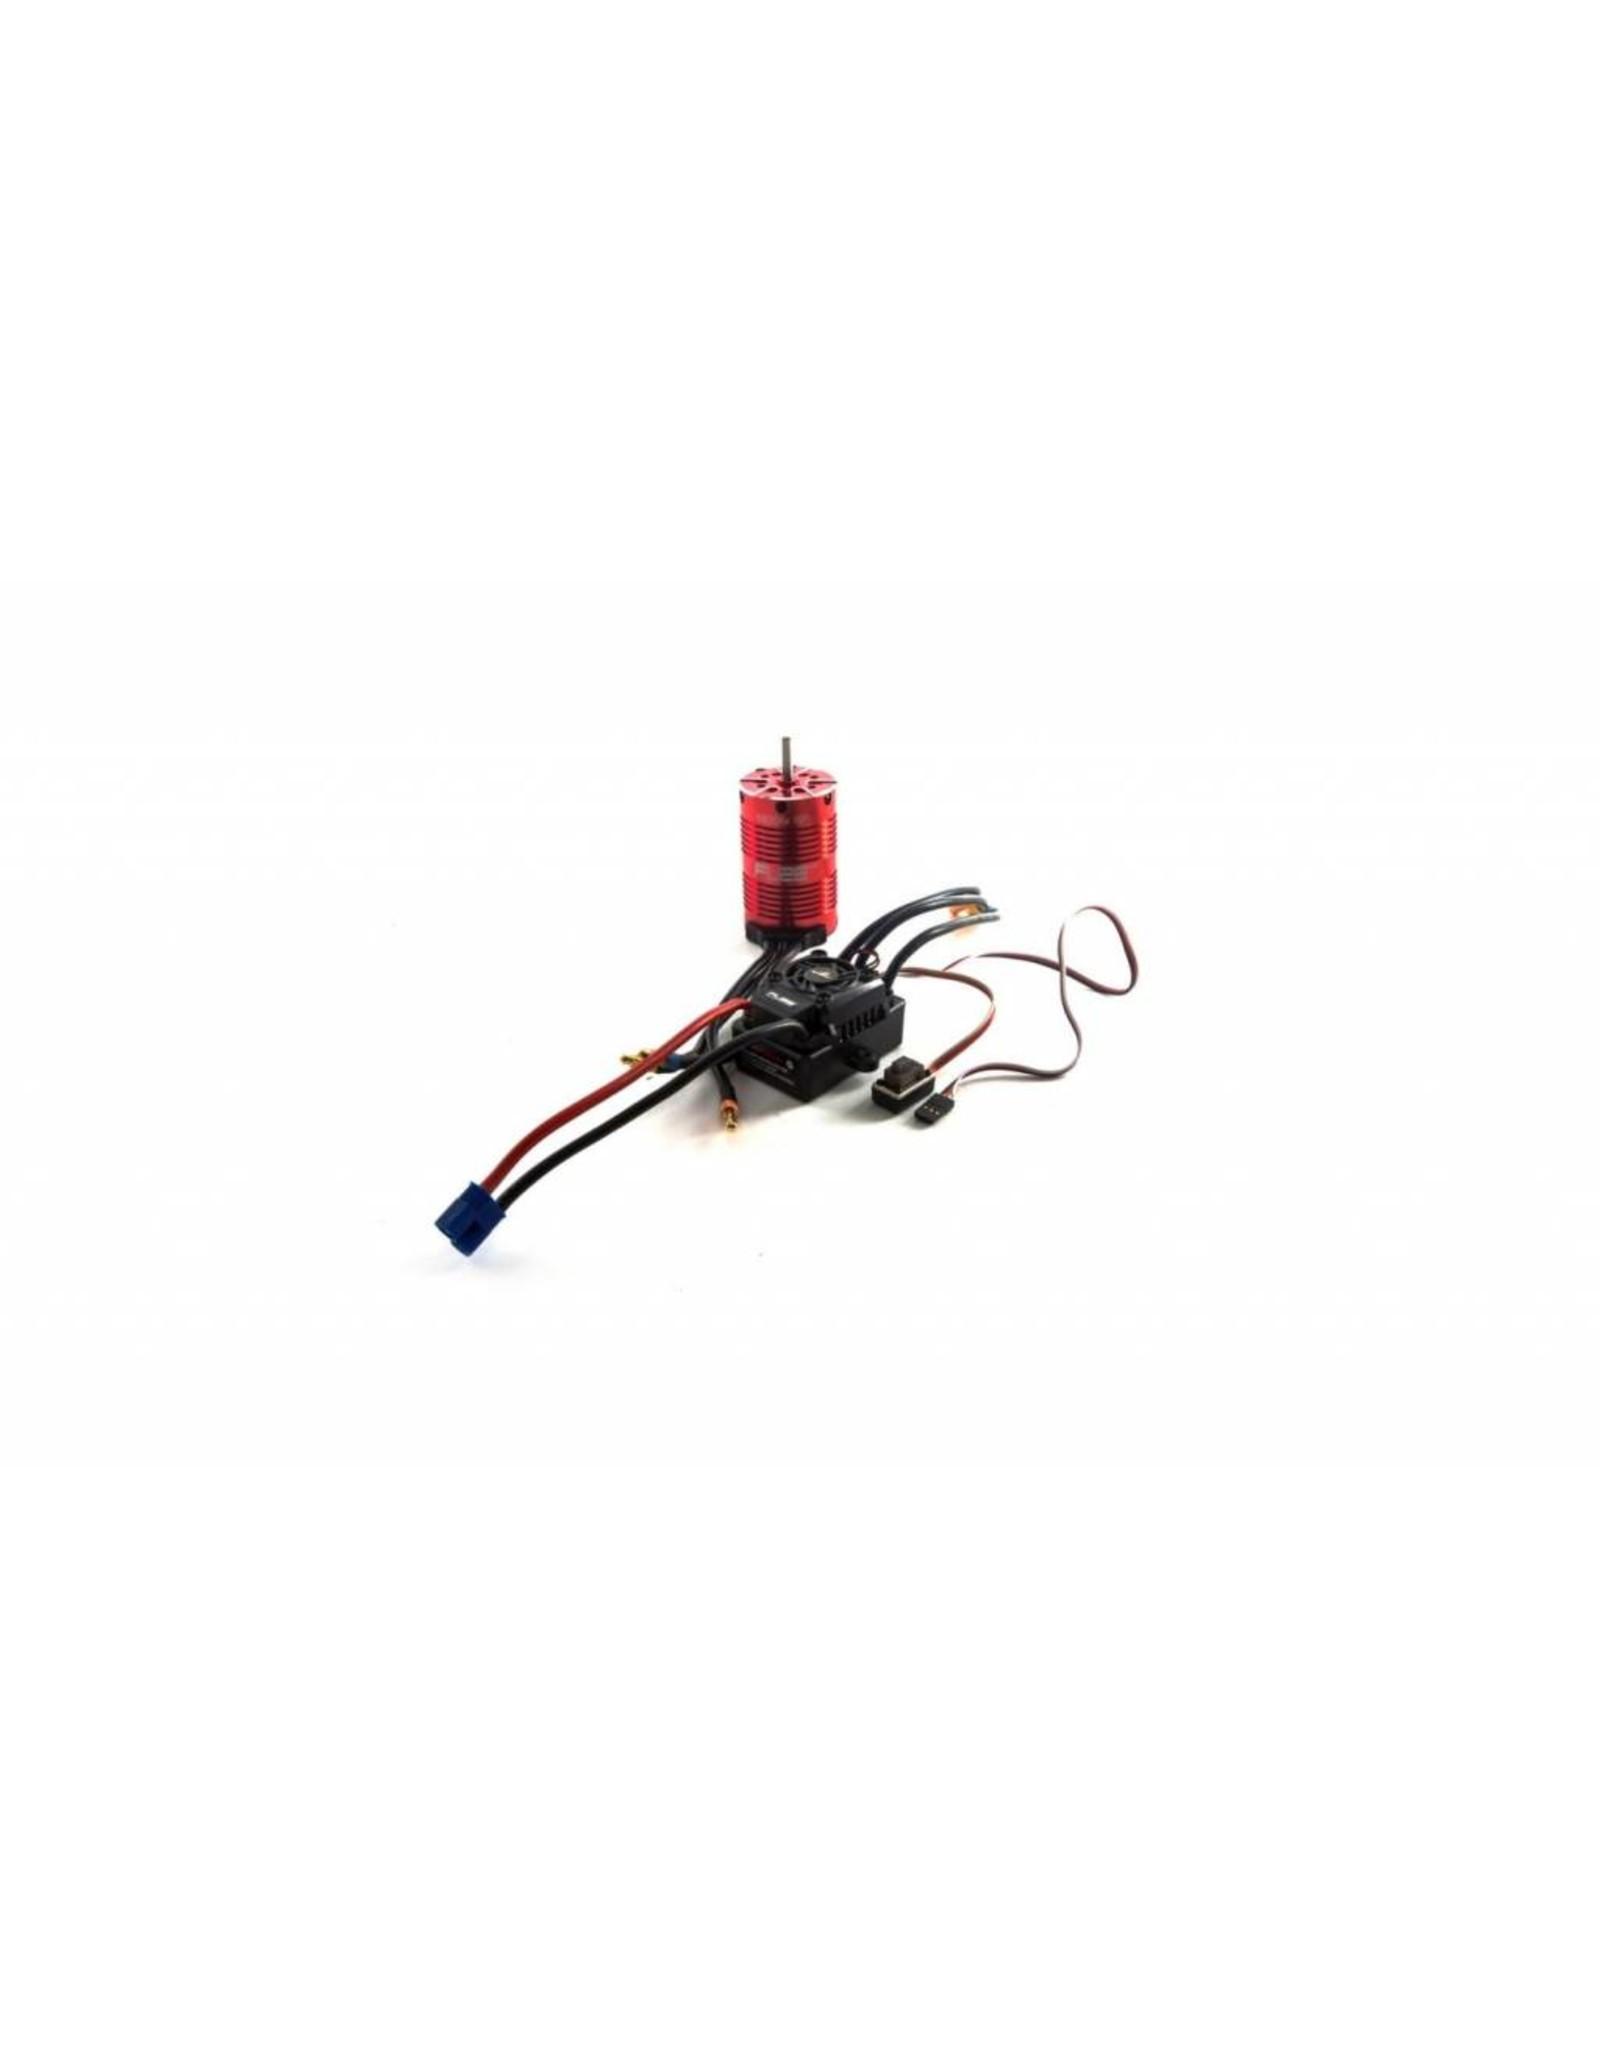 Dynamite Fuze 1/8 6-pole 1800Kv WP ESC/Motor Combo V2